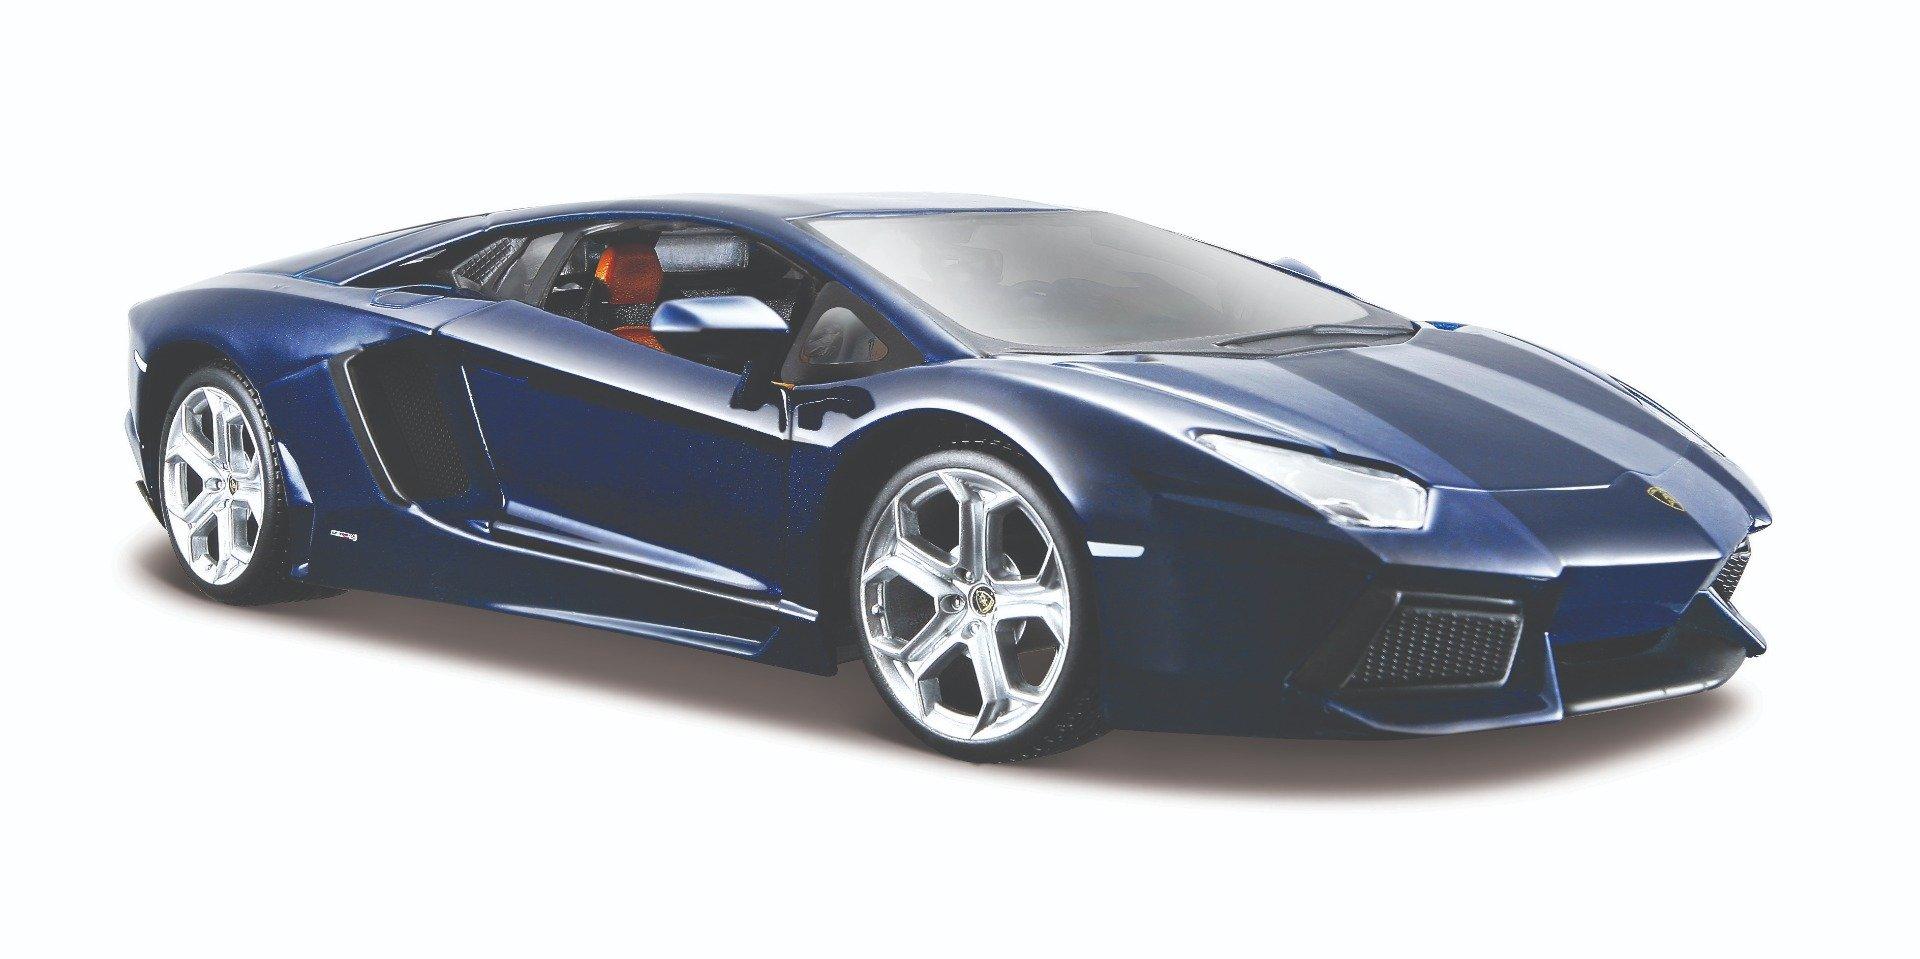 Masinuta Maisto Lamborghini Aventador LP 700 4